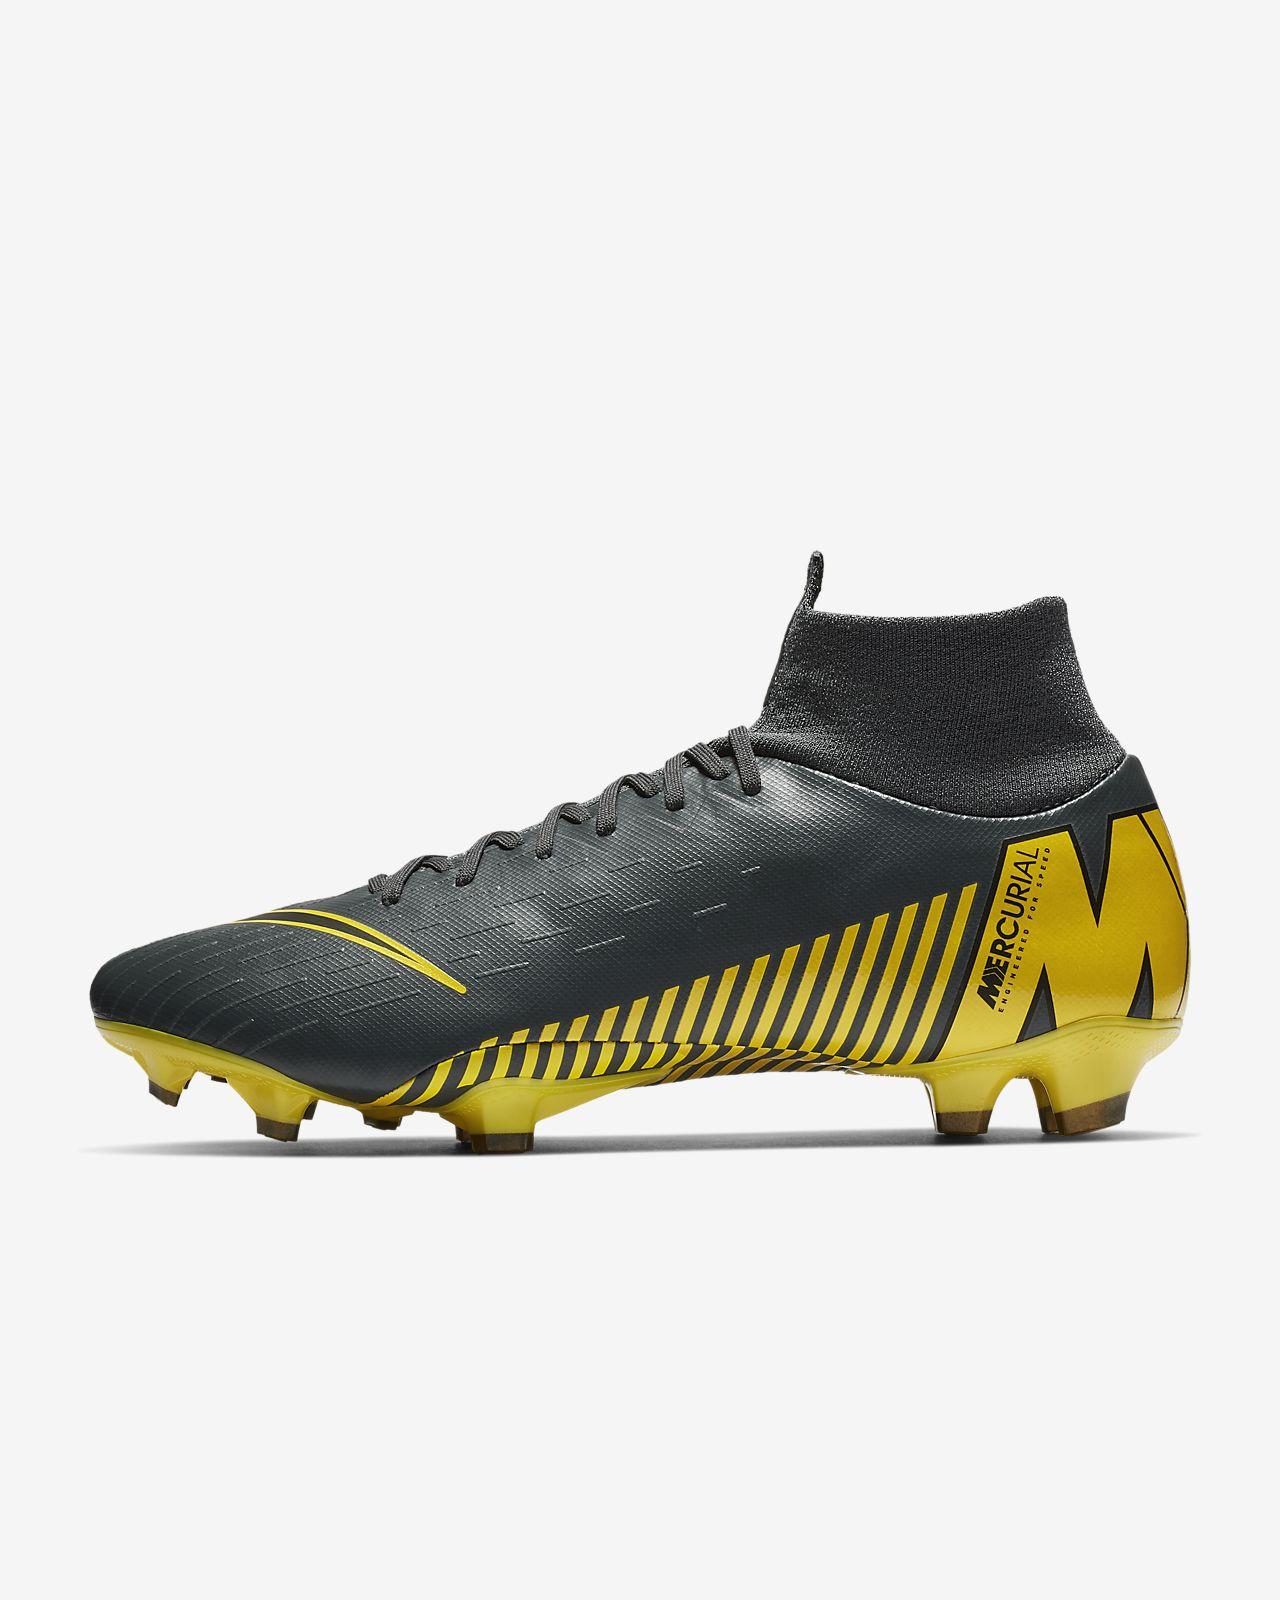 low priced 43ea3 4c091 Nike Superfly 6 Pro FG Botas de fútbol para terreno firme